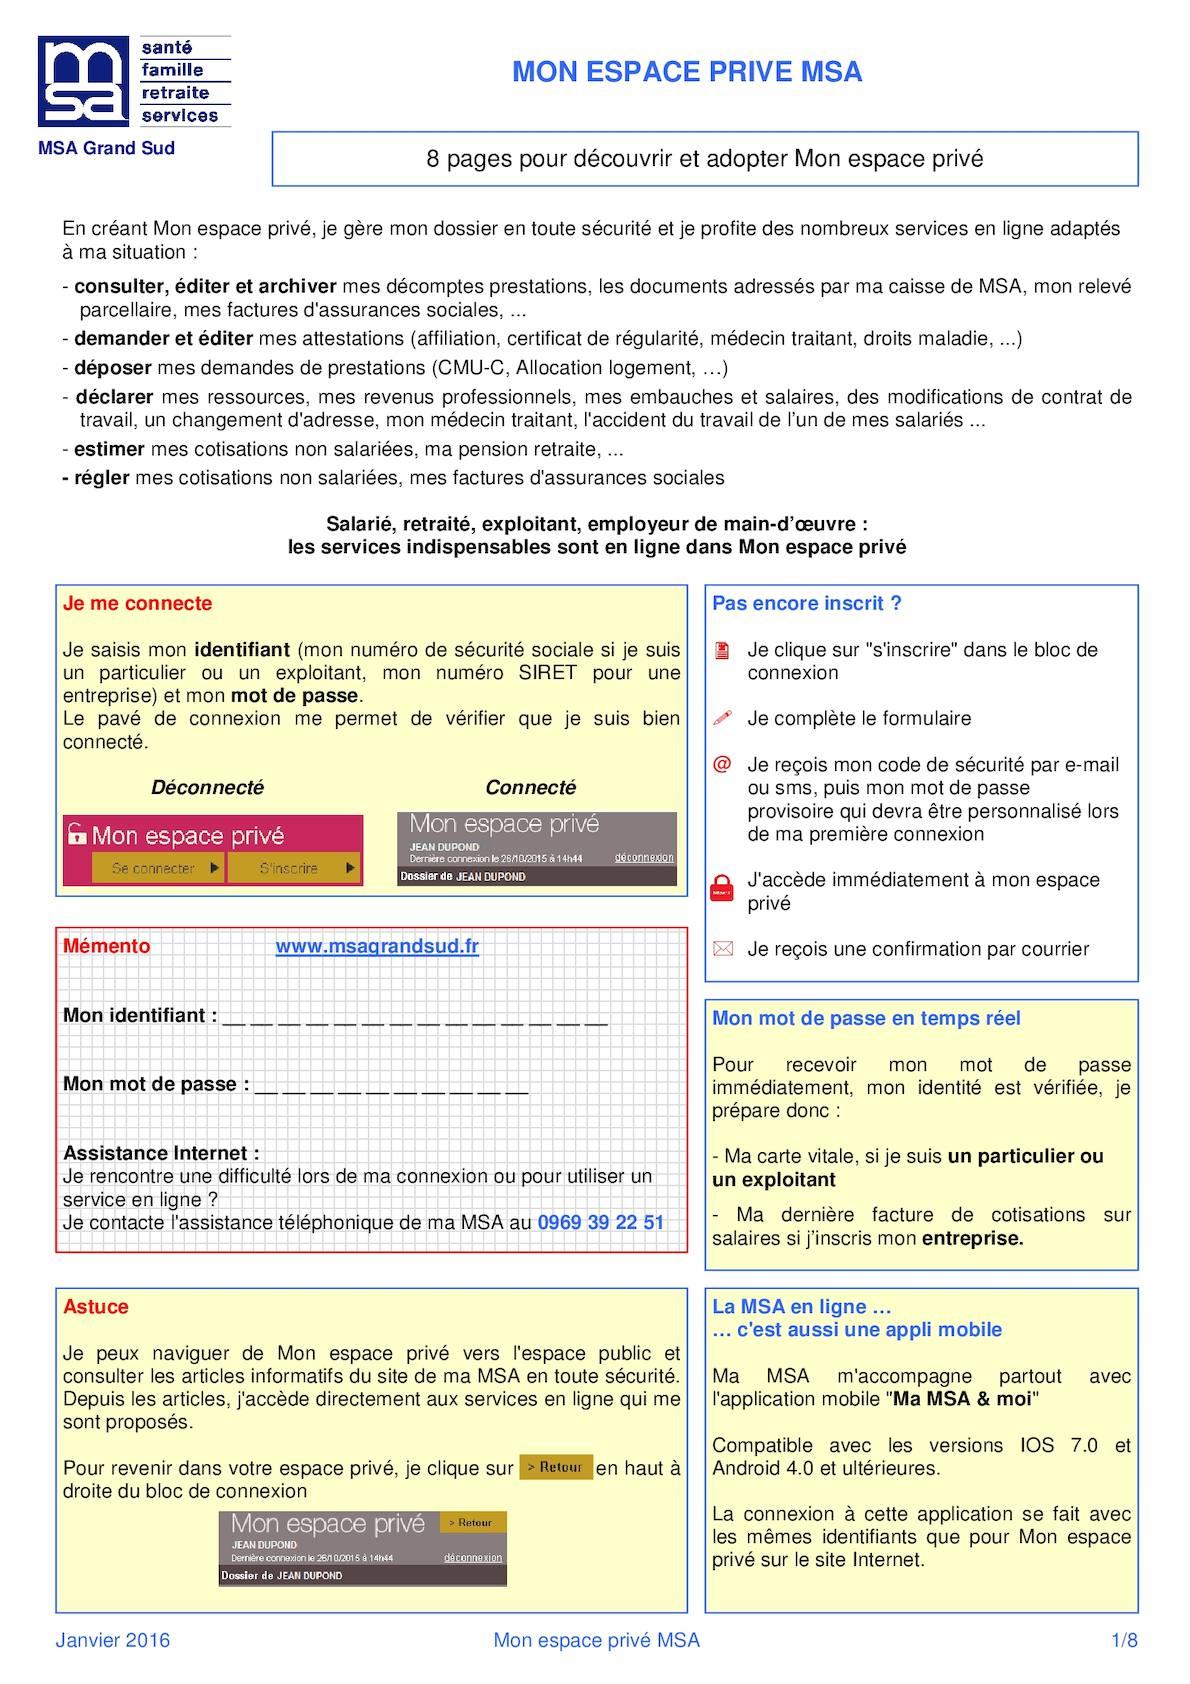 Carte Assurance Maladie Msa.Calameo Mon Espace Prive Msa Version 01 2016